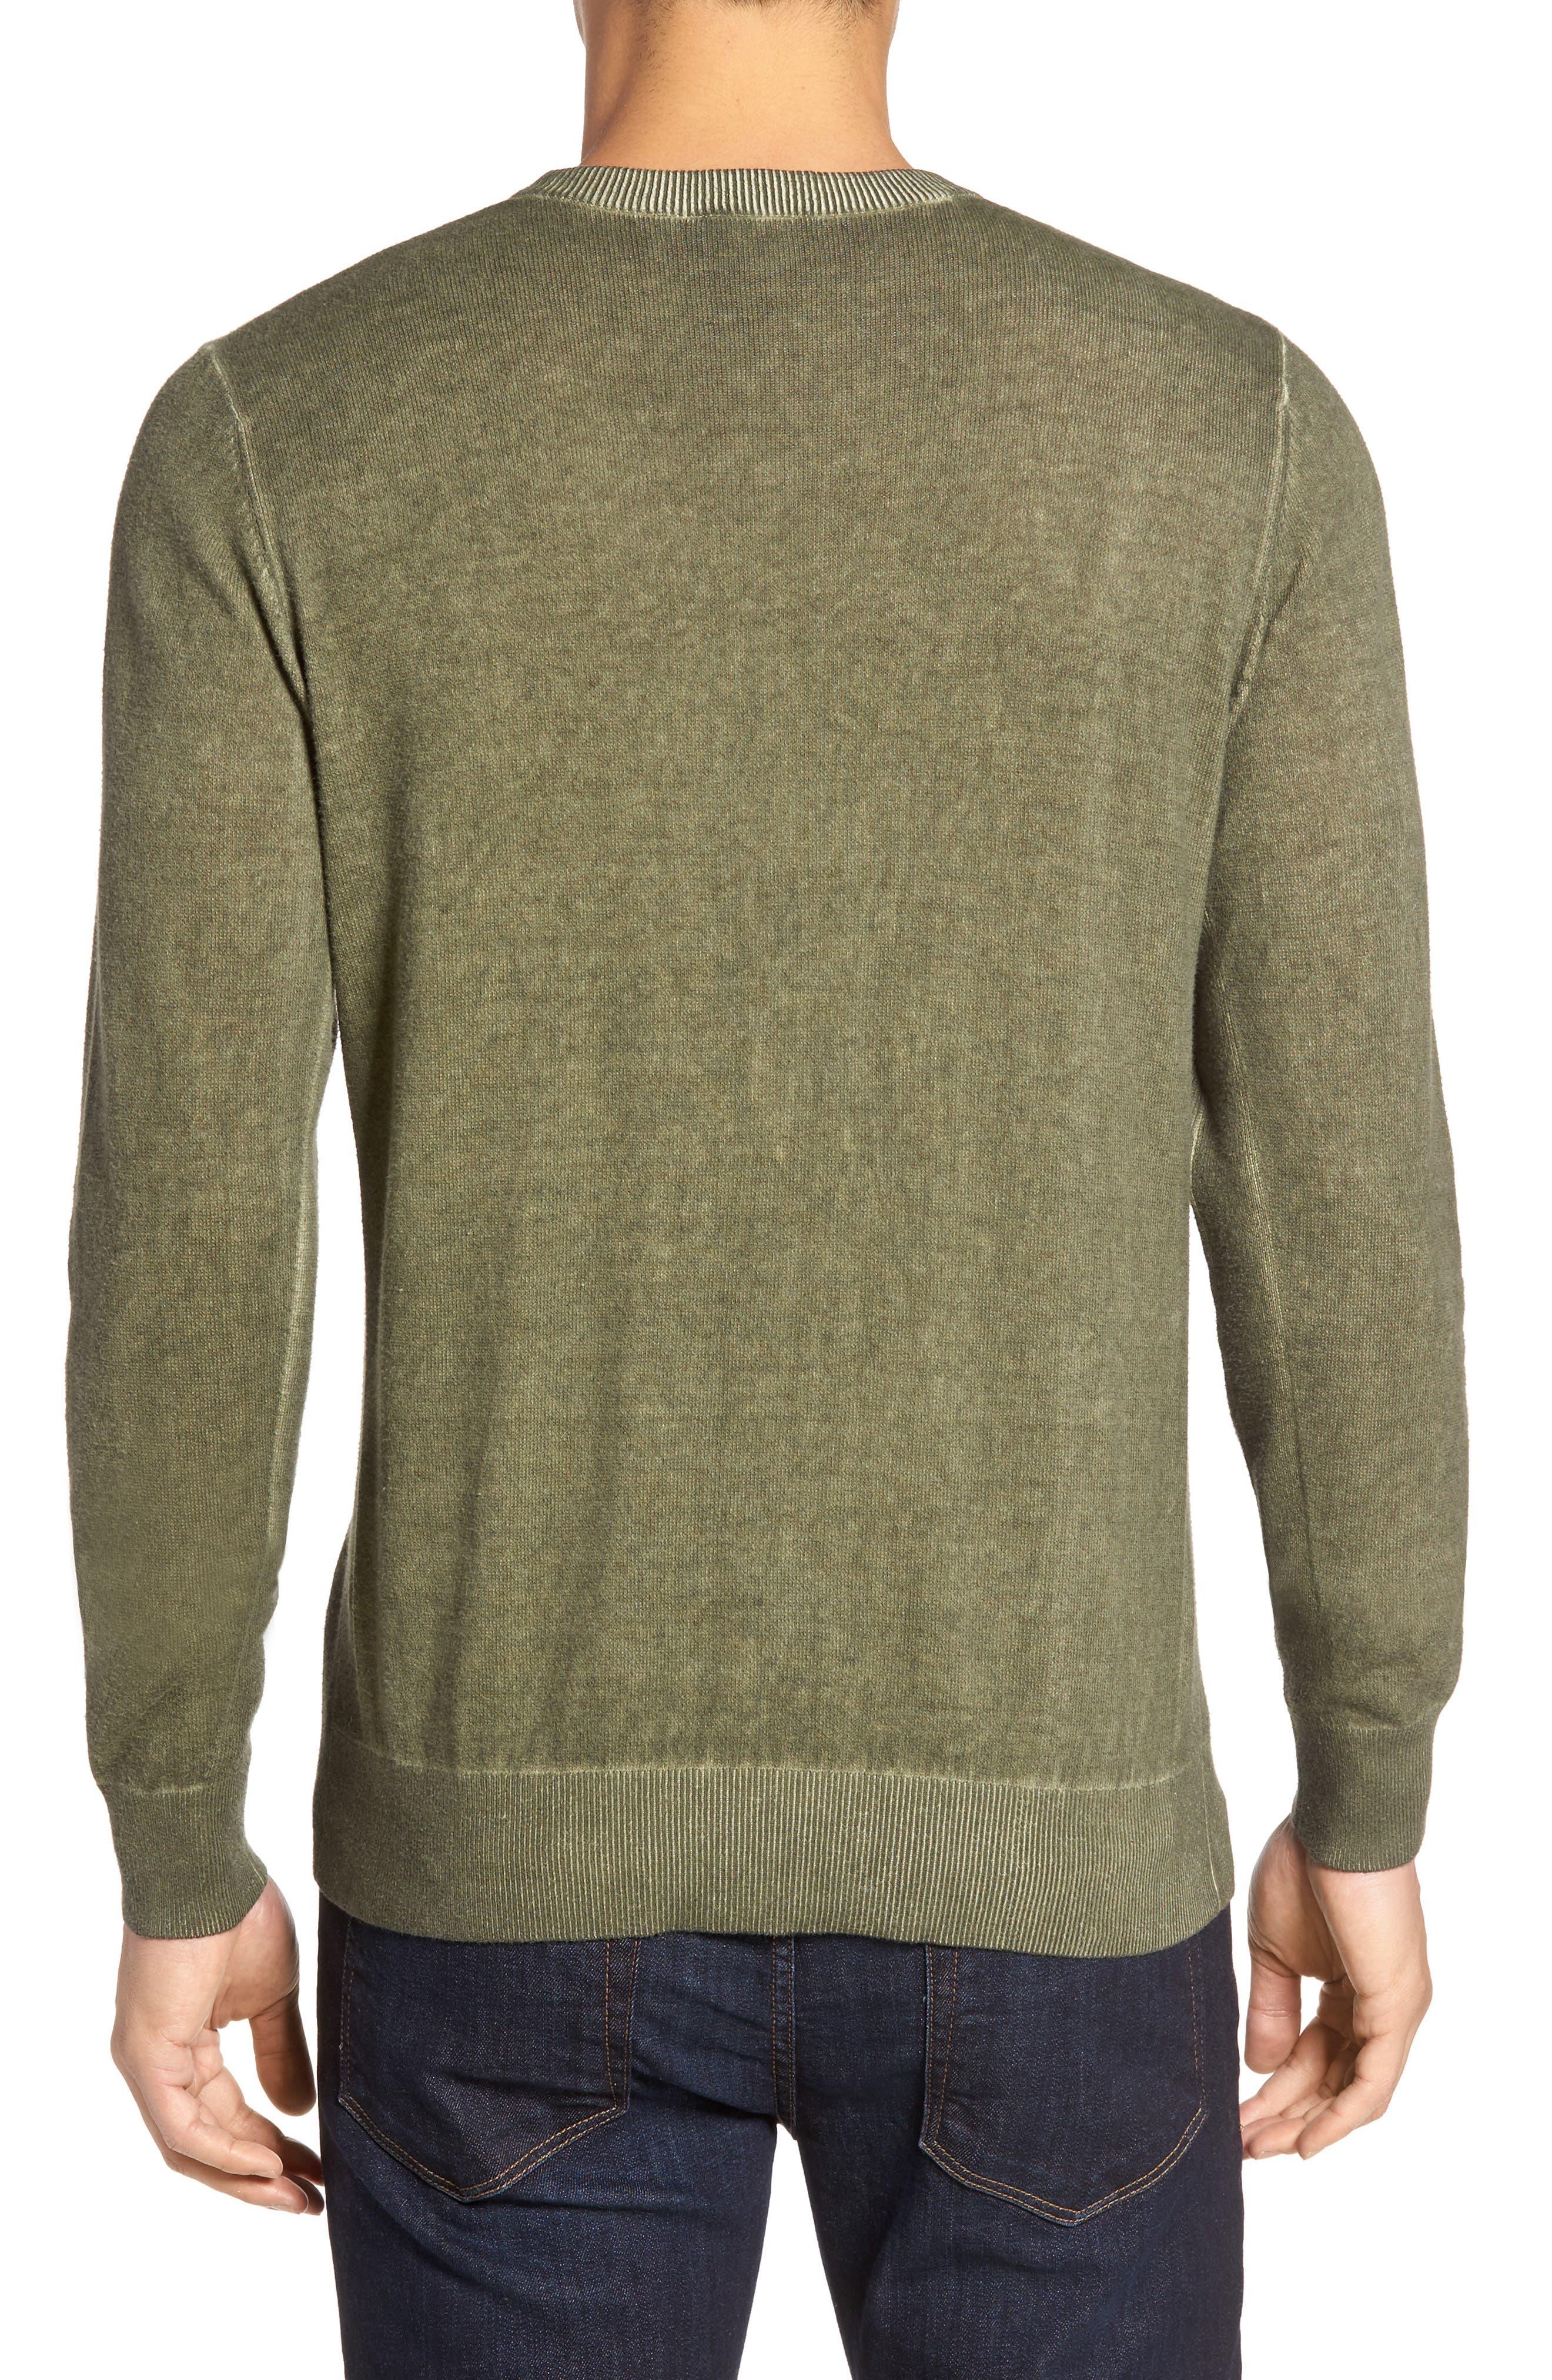 Mace Crewneck Sweater,                             Alternate thumbnail 2, color,                             316